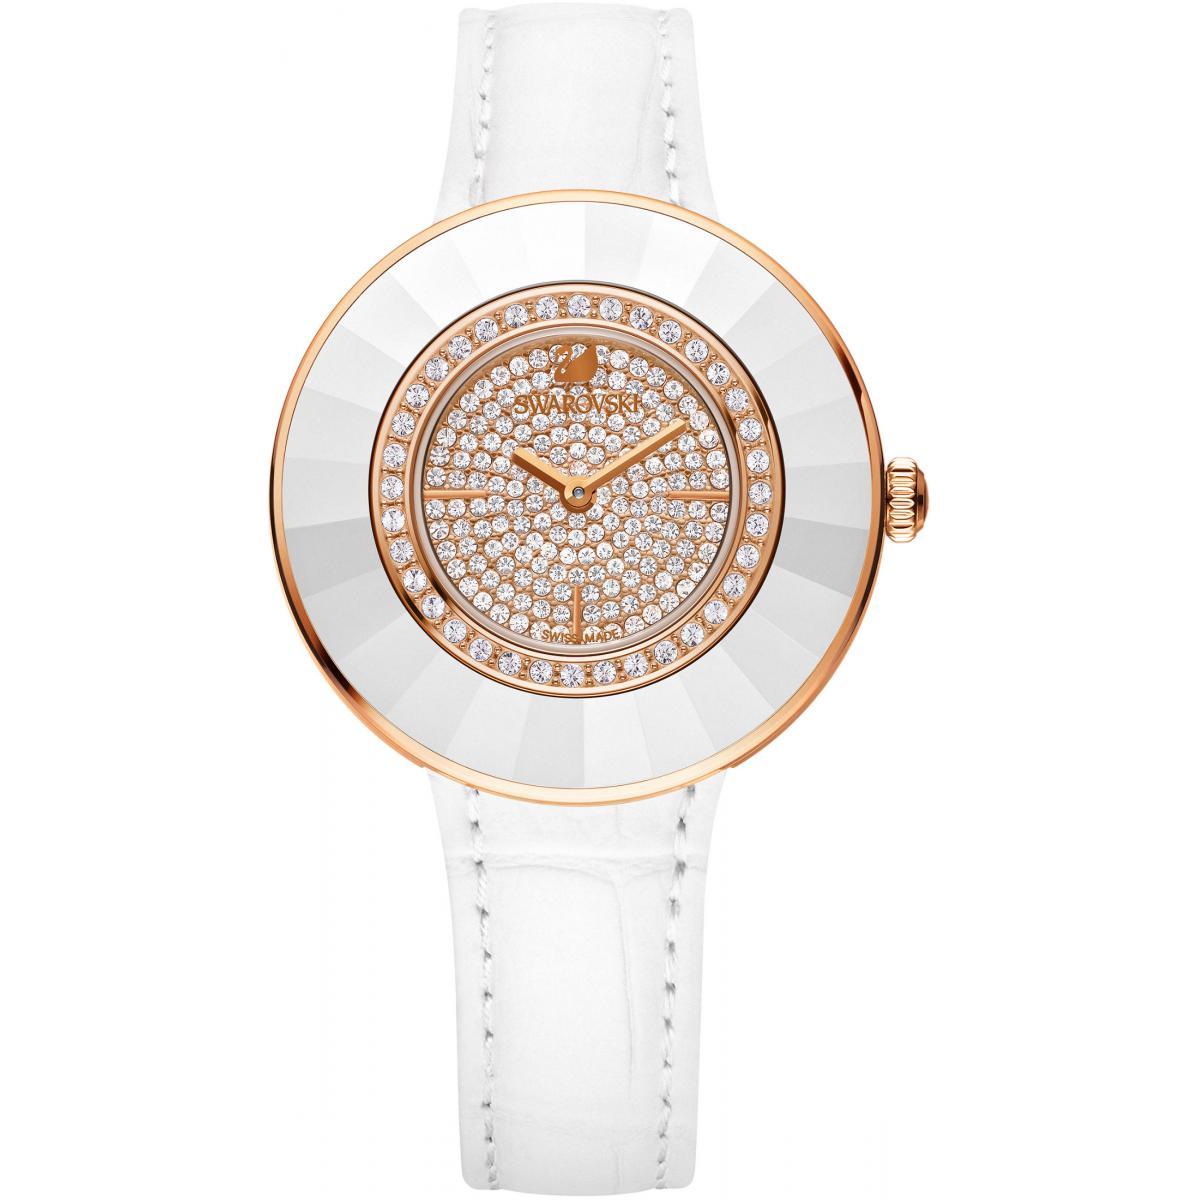 Montre Swarovski OCTEA 5095383 - Montre Blanche Ronde - Swarovski montres - Modalova